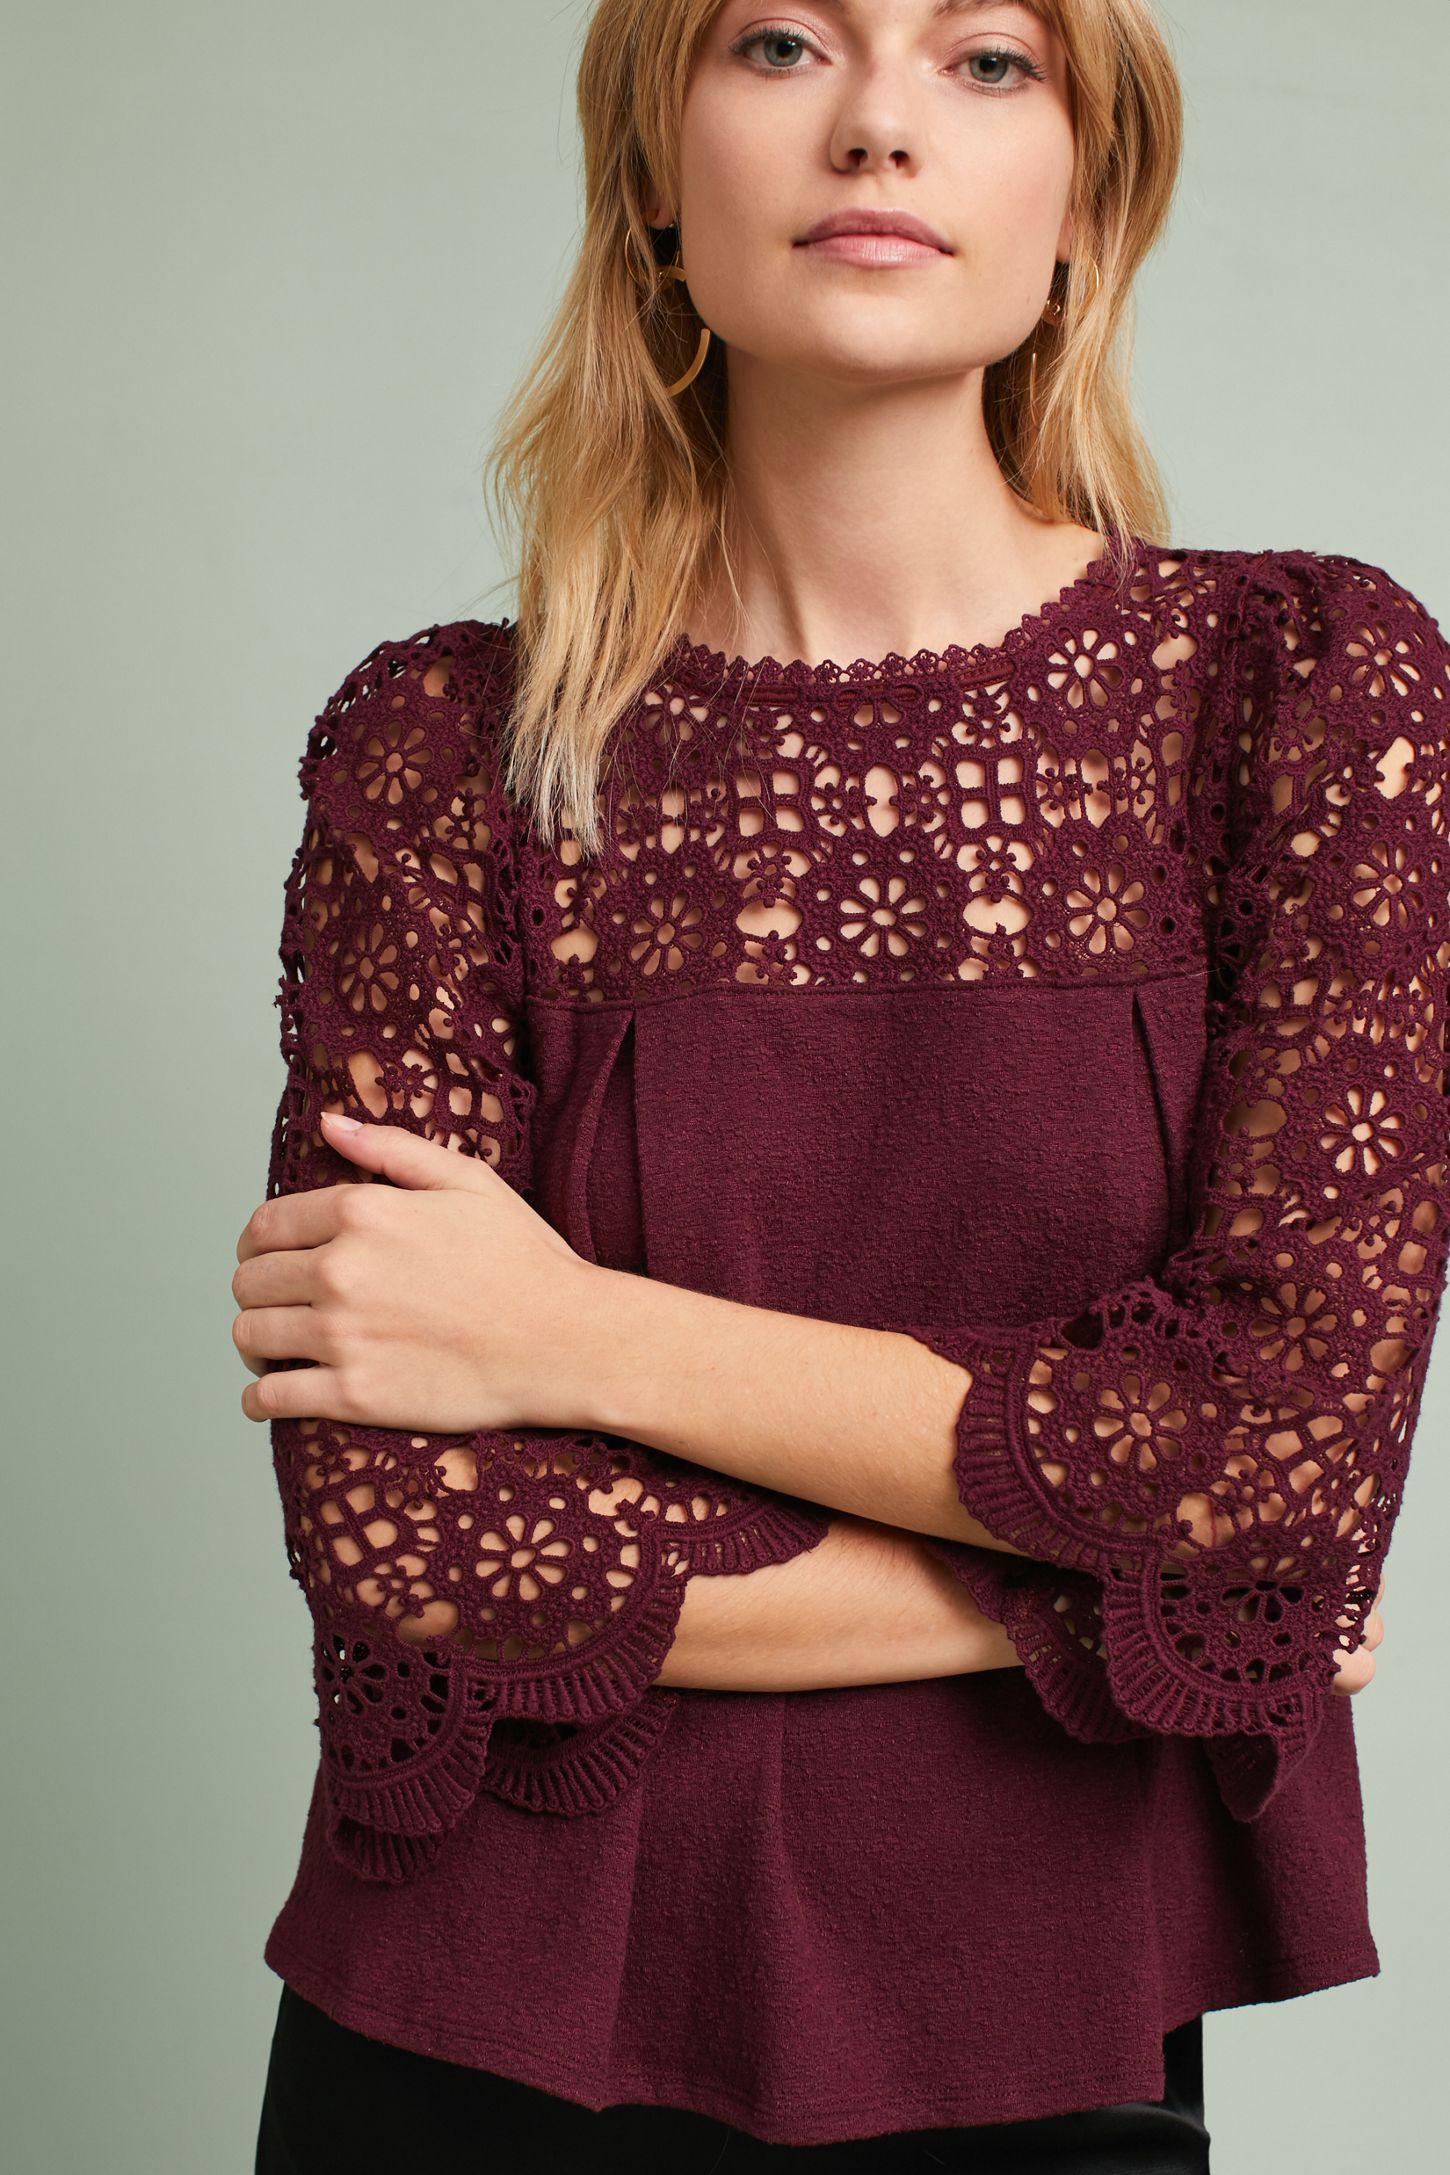 bf51a9ba20c8b Marigold Lace Top